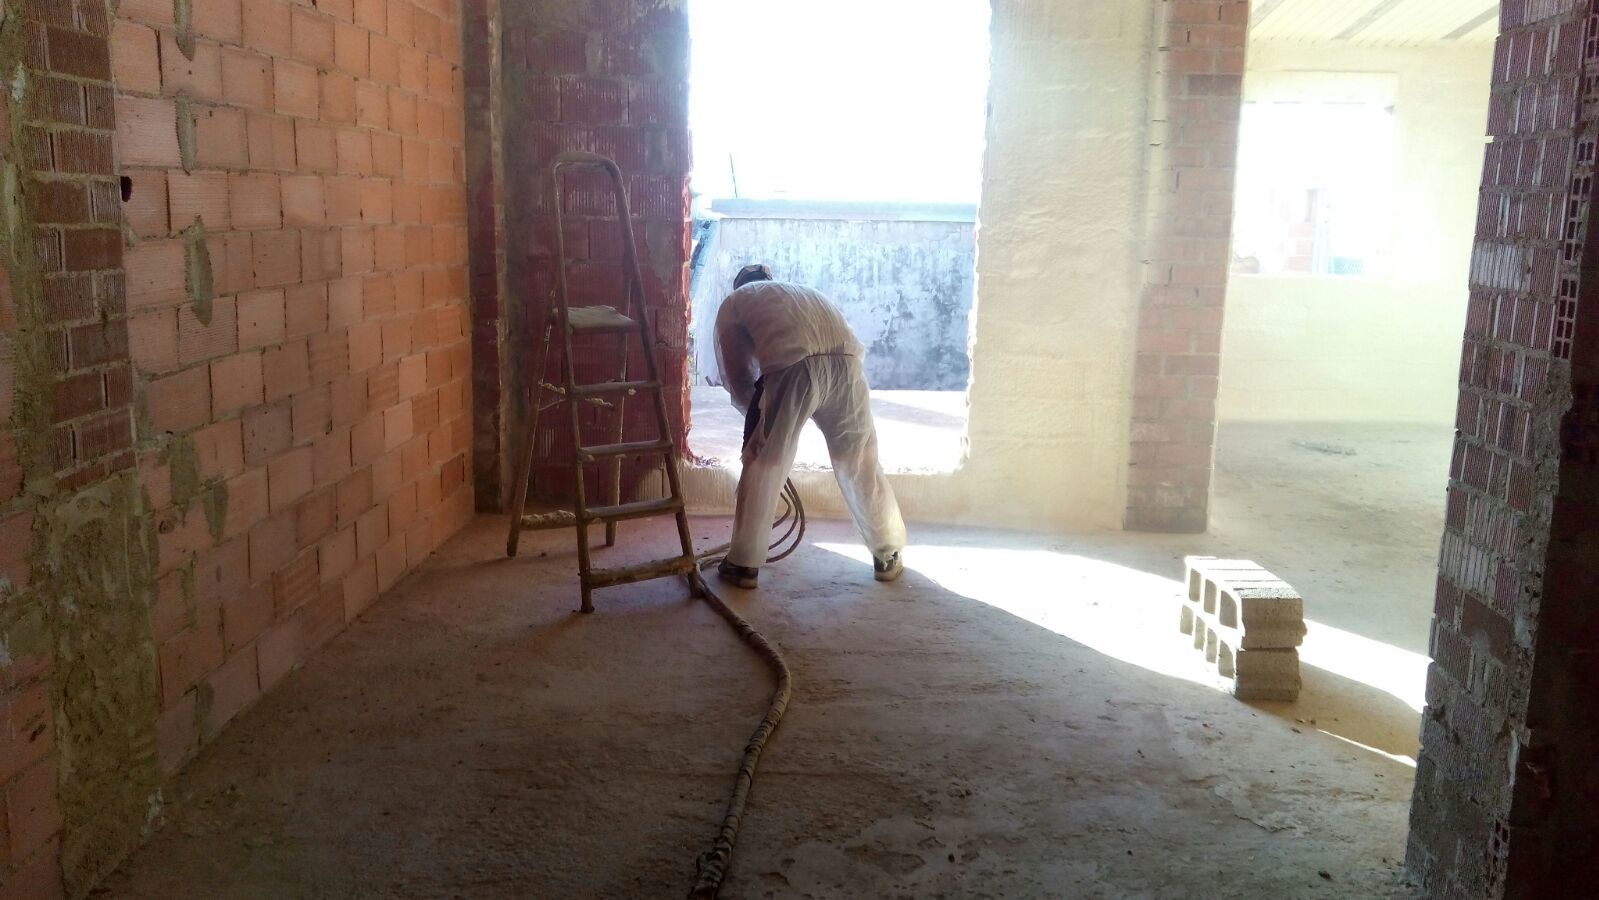 Foto 47 de Aislamientos acústicos y térmicos en Rafelcofer | Aislamientos de Poliuretano Jaime Femenia